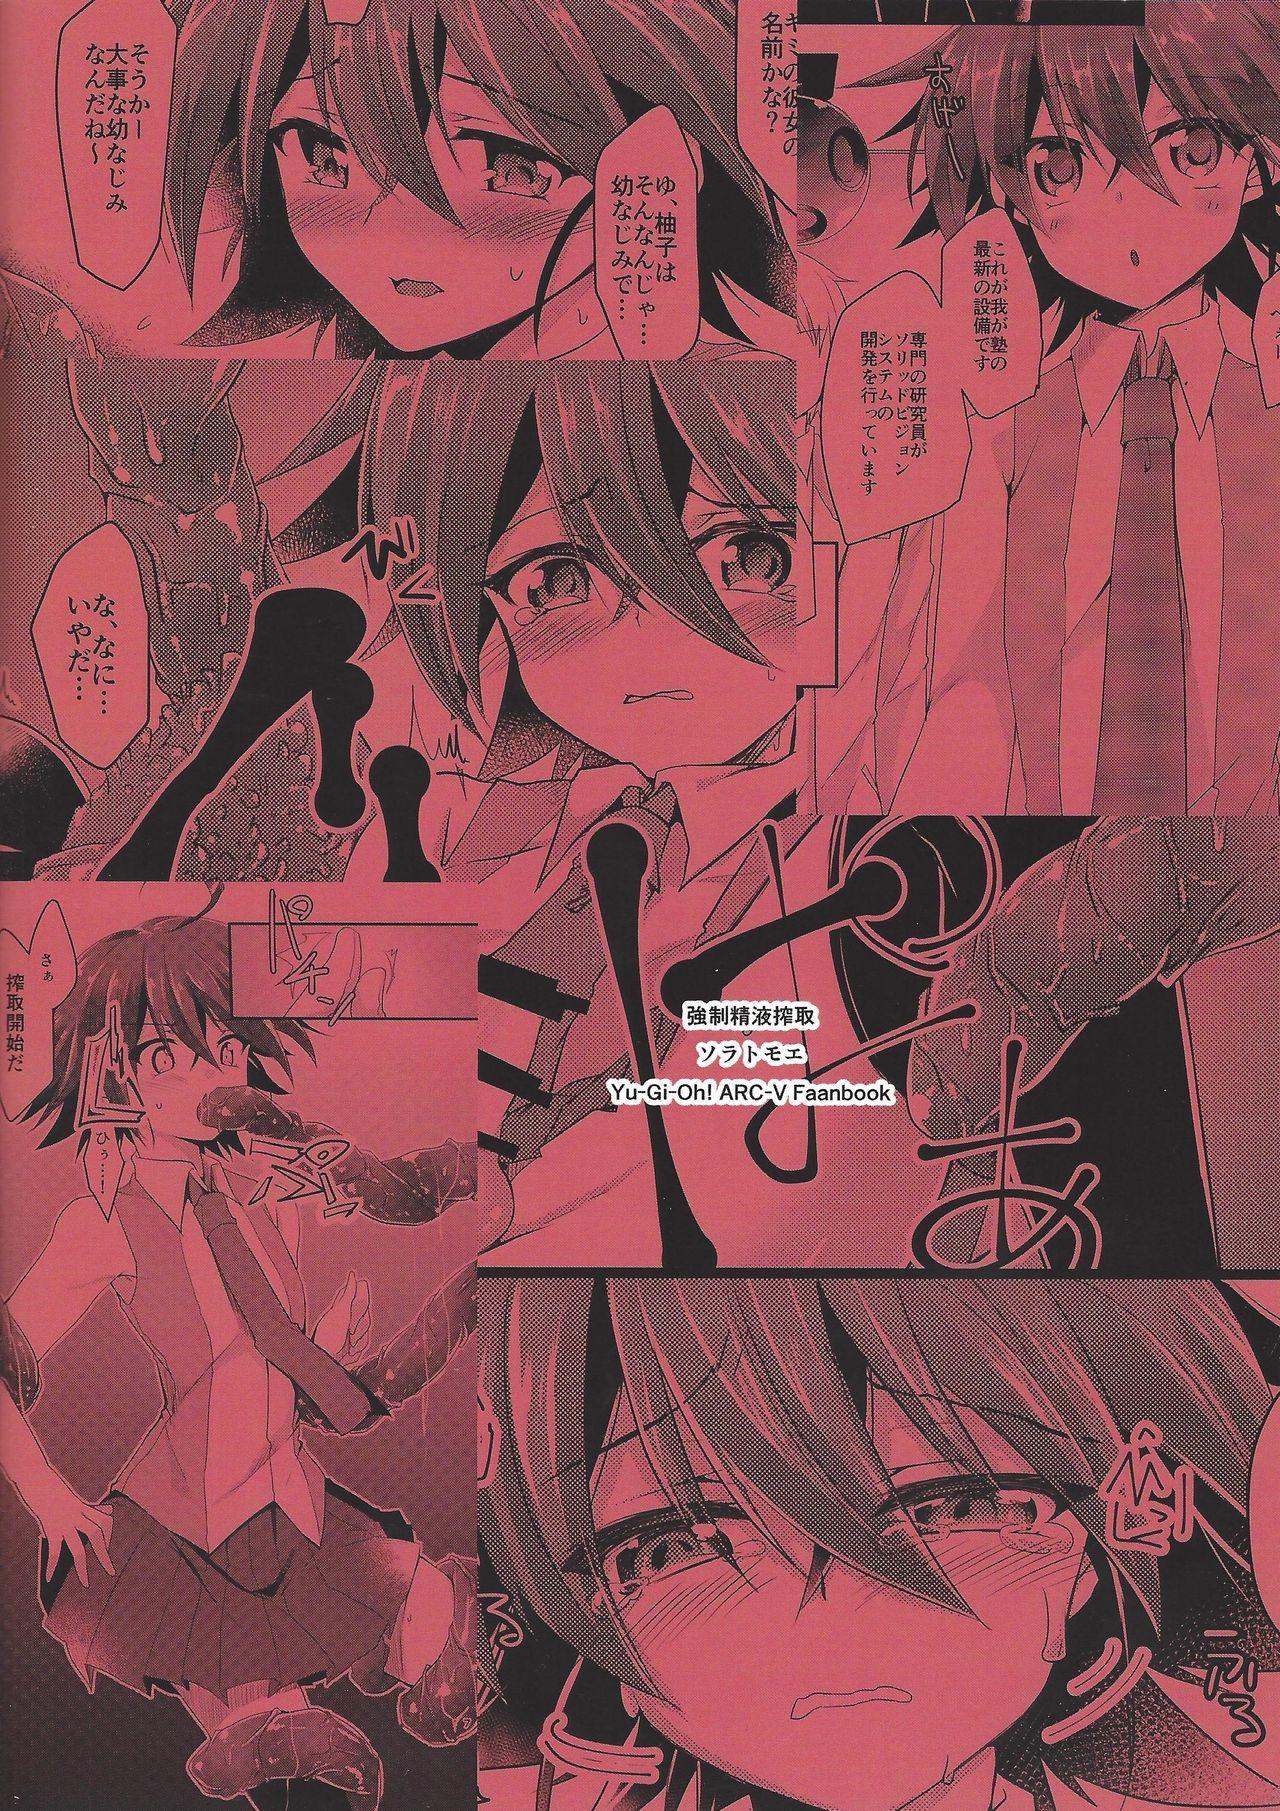 Kyousei Seieki Sakushu 17